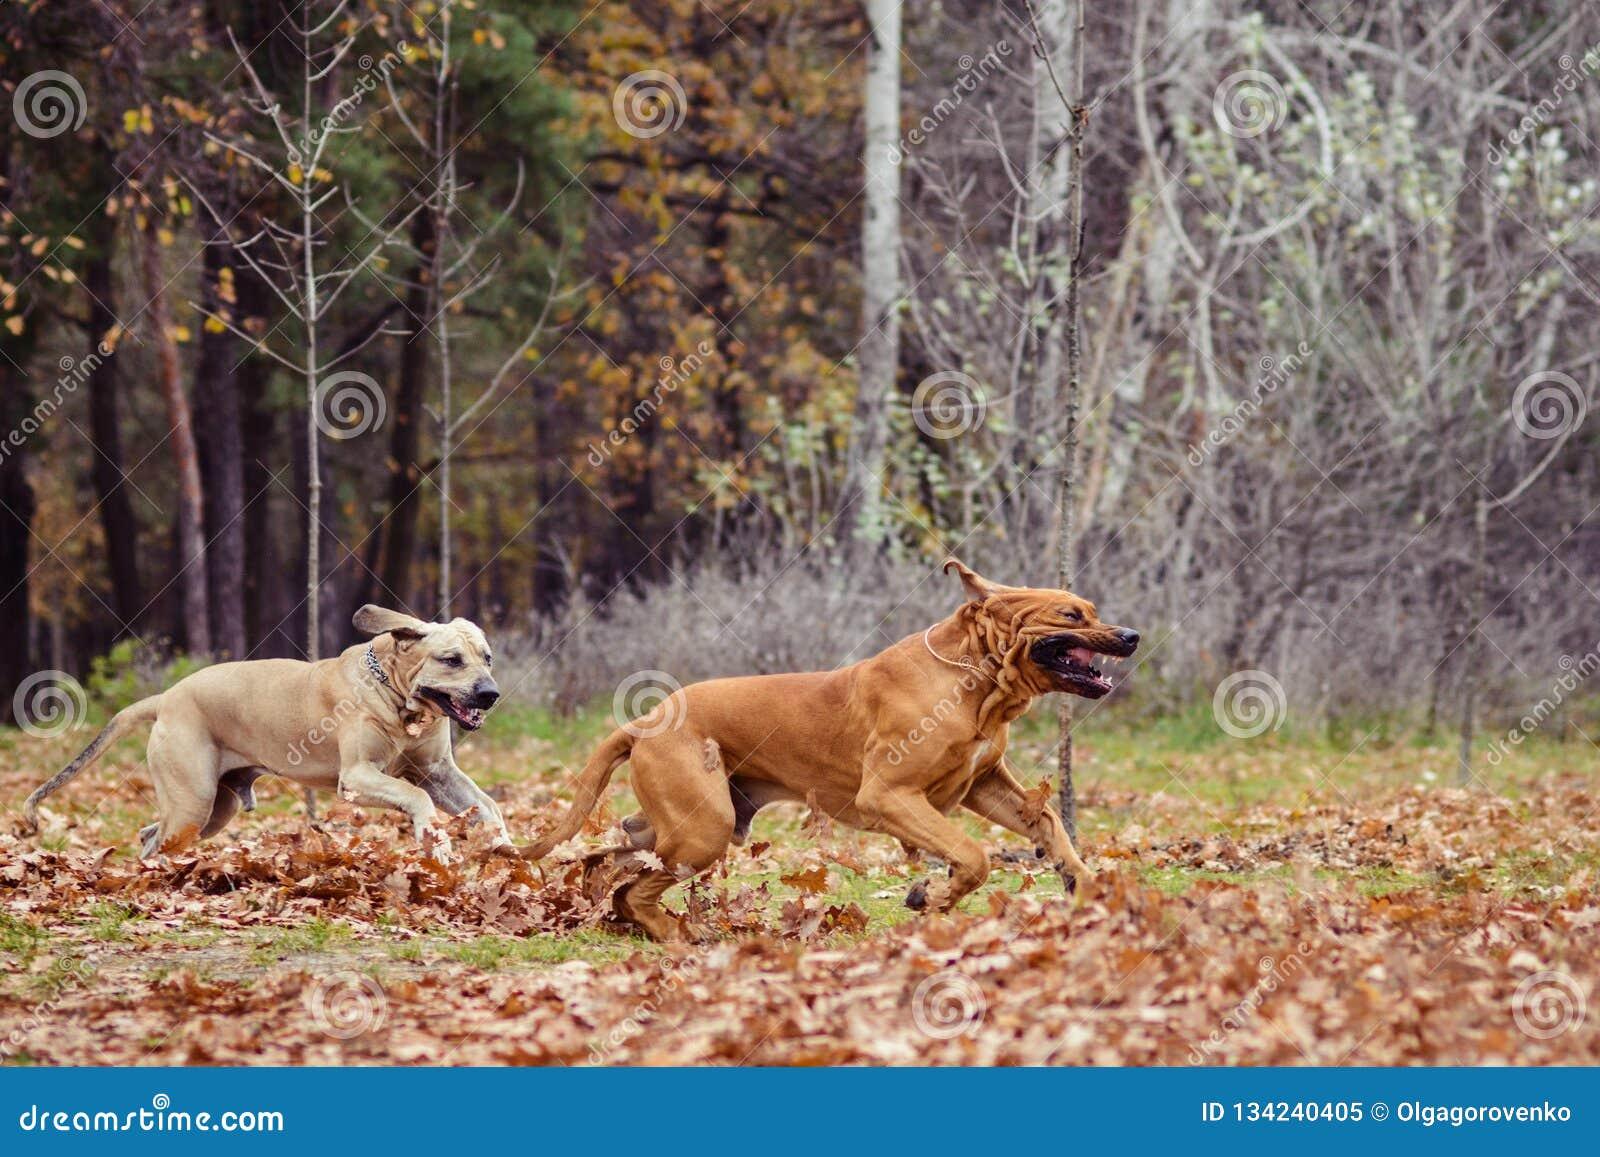 Two Fila Brasileiro dogs, autumn scene